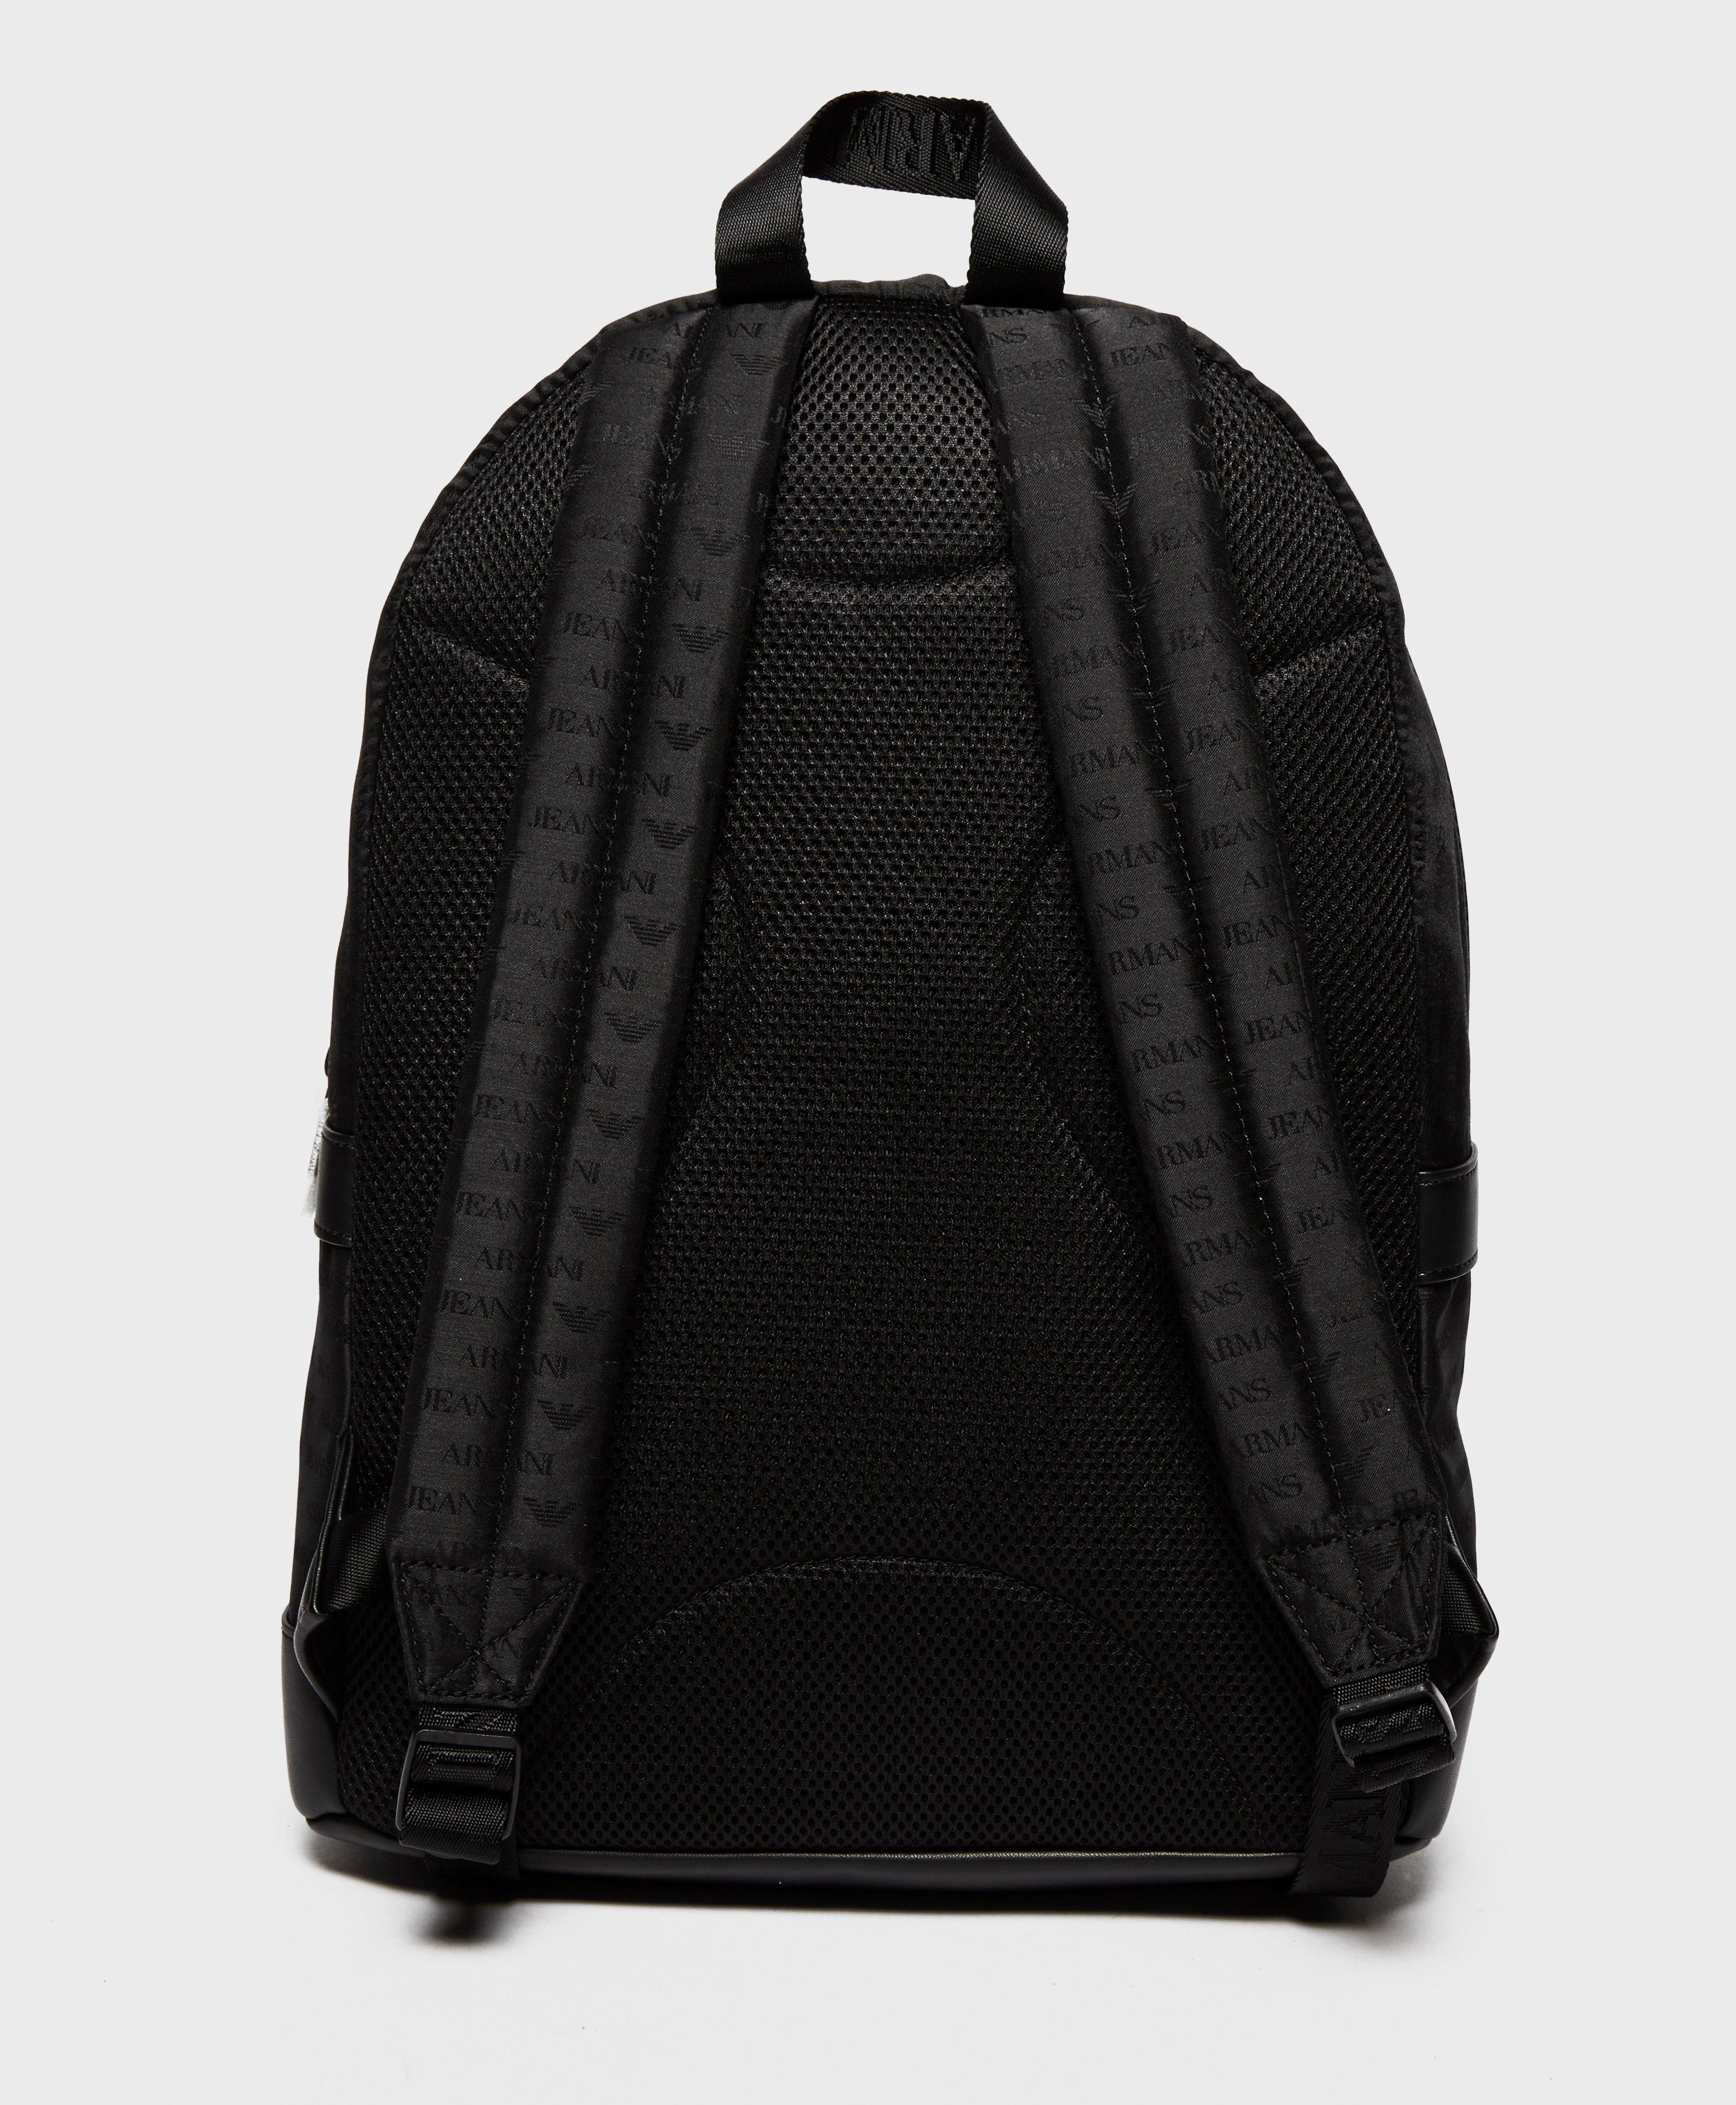 Armani Jeans Nylon Backpack in Black for Men - Lyst 920f4687dc7ff